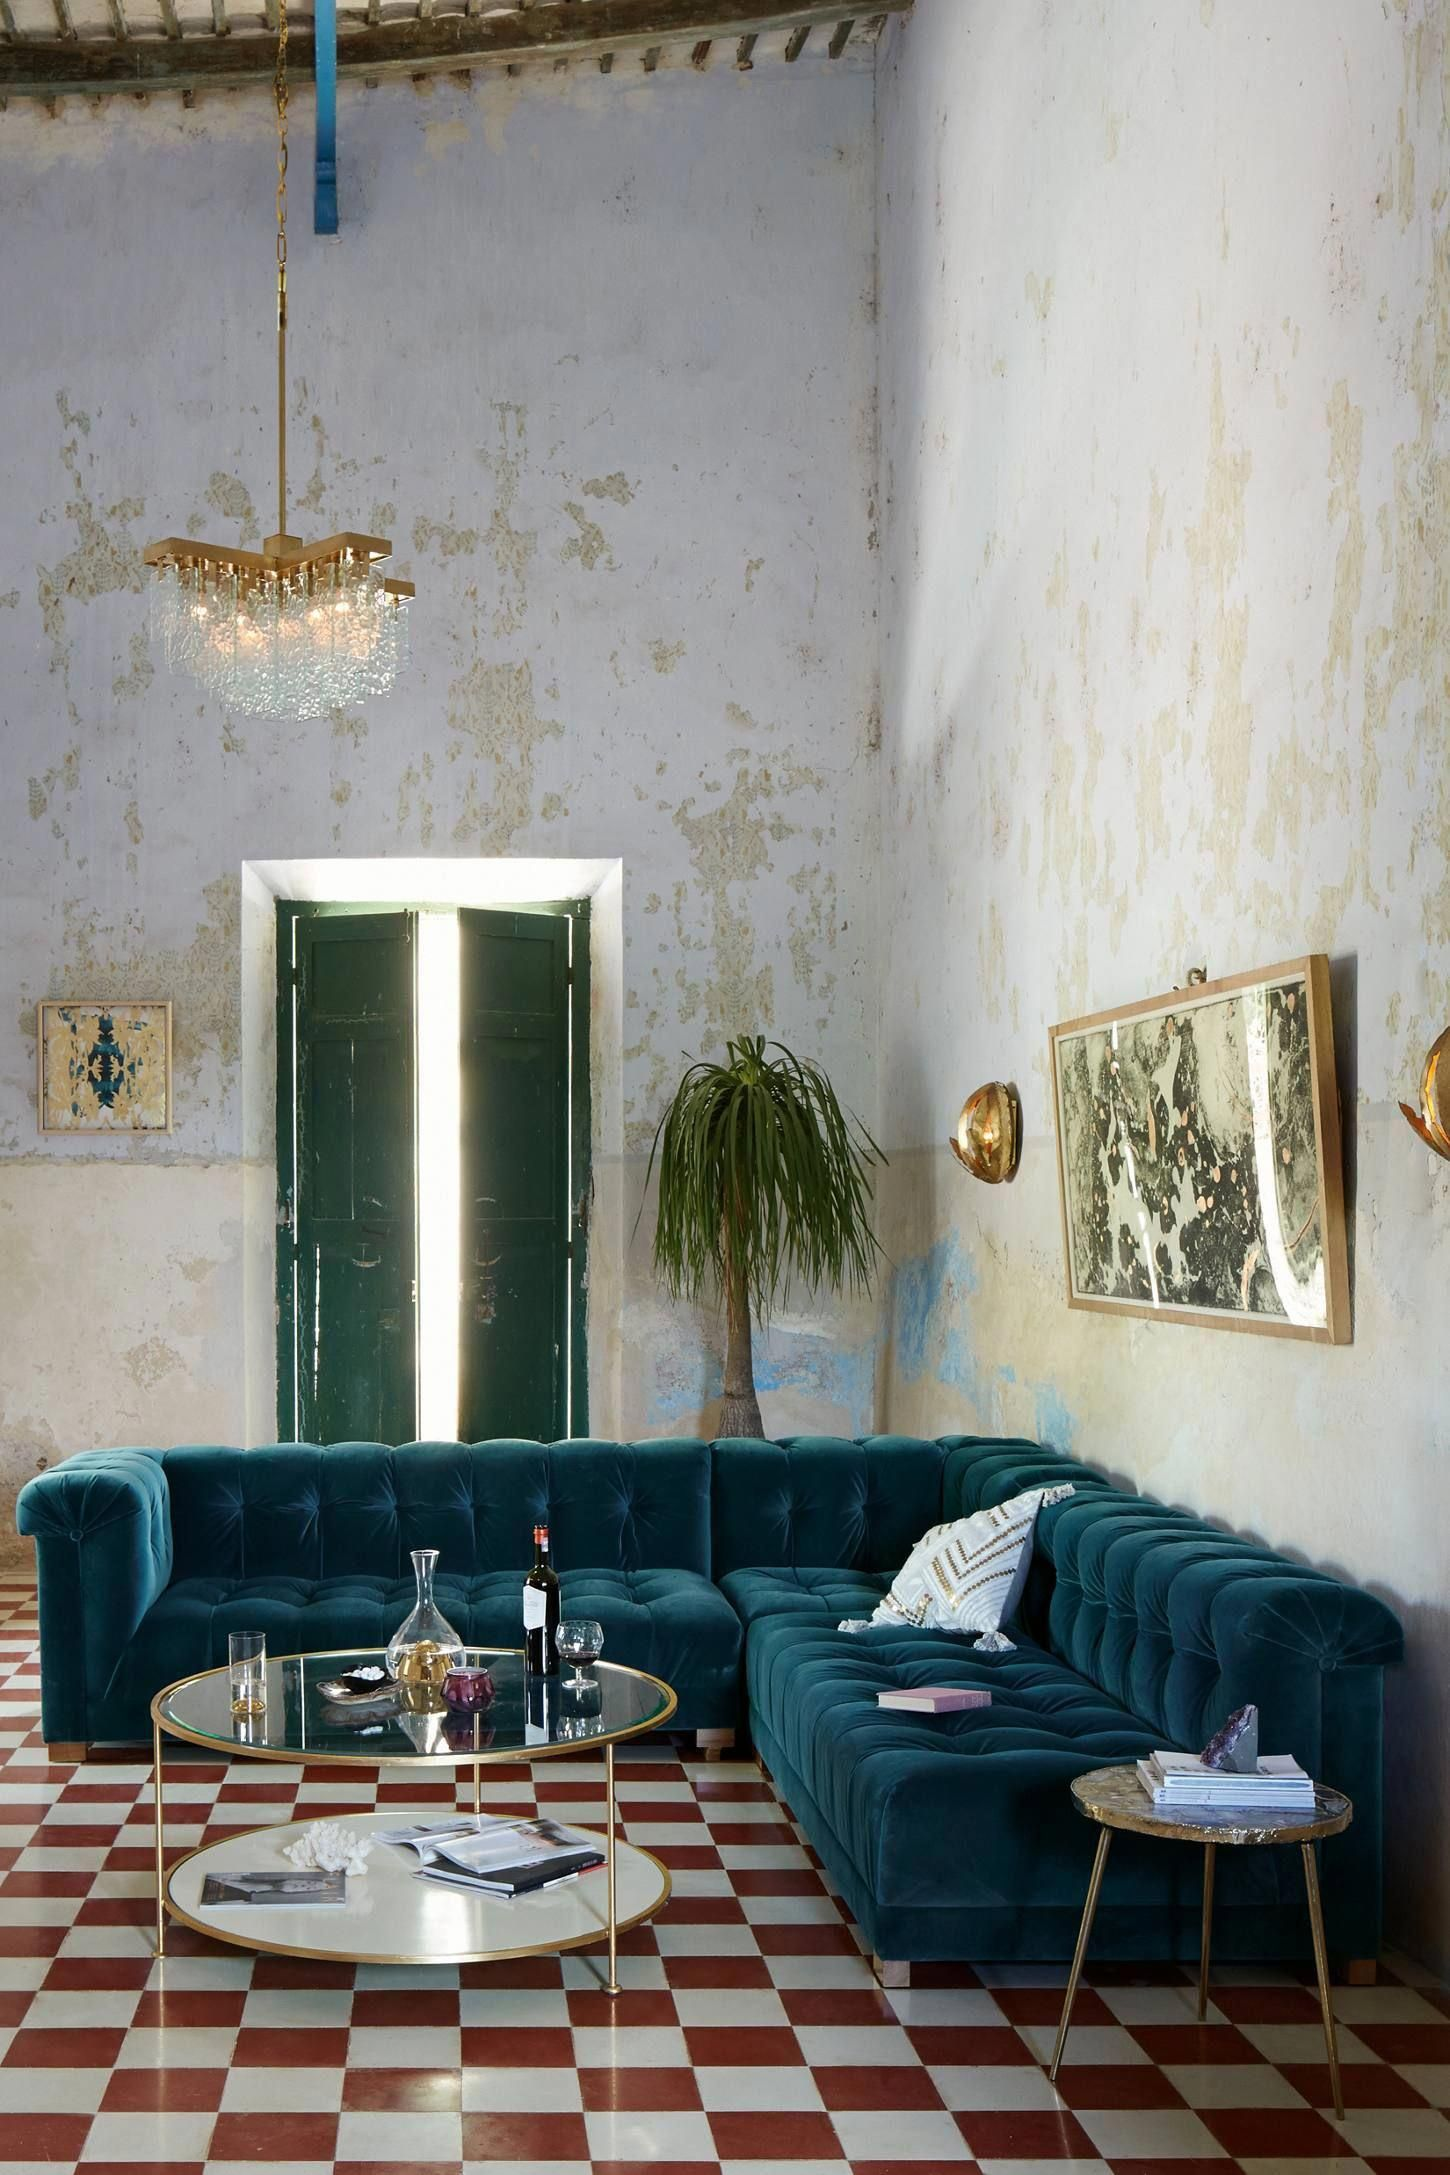 Contemporary interior design inspiration for your perfect home interiordesignforlivingroom also rh pinterest